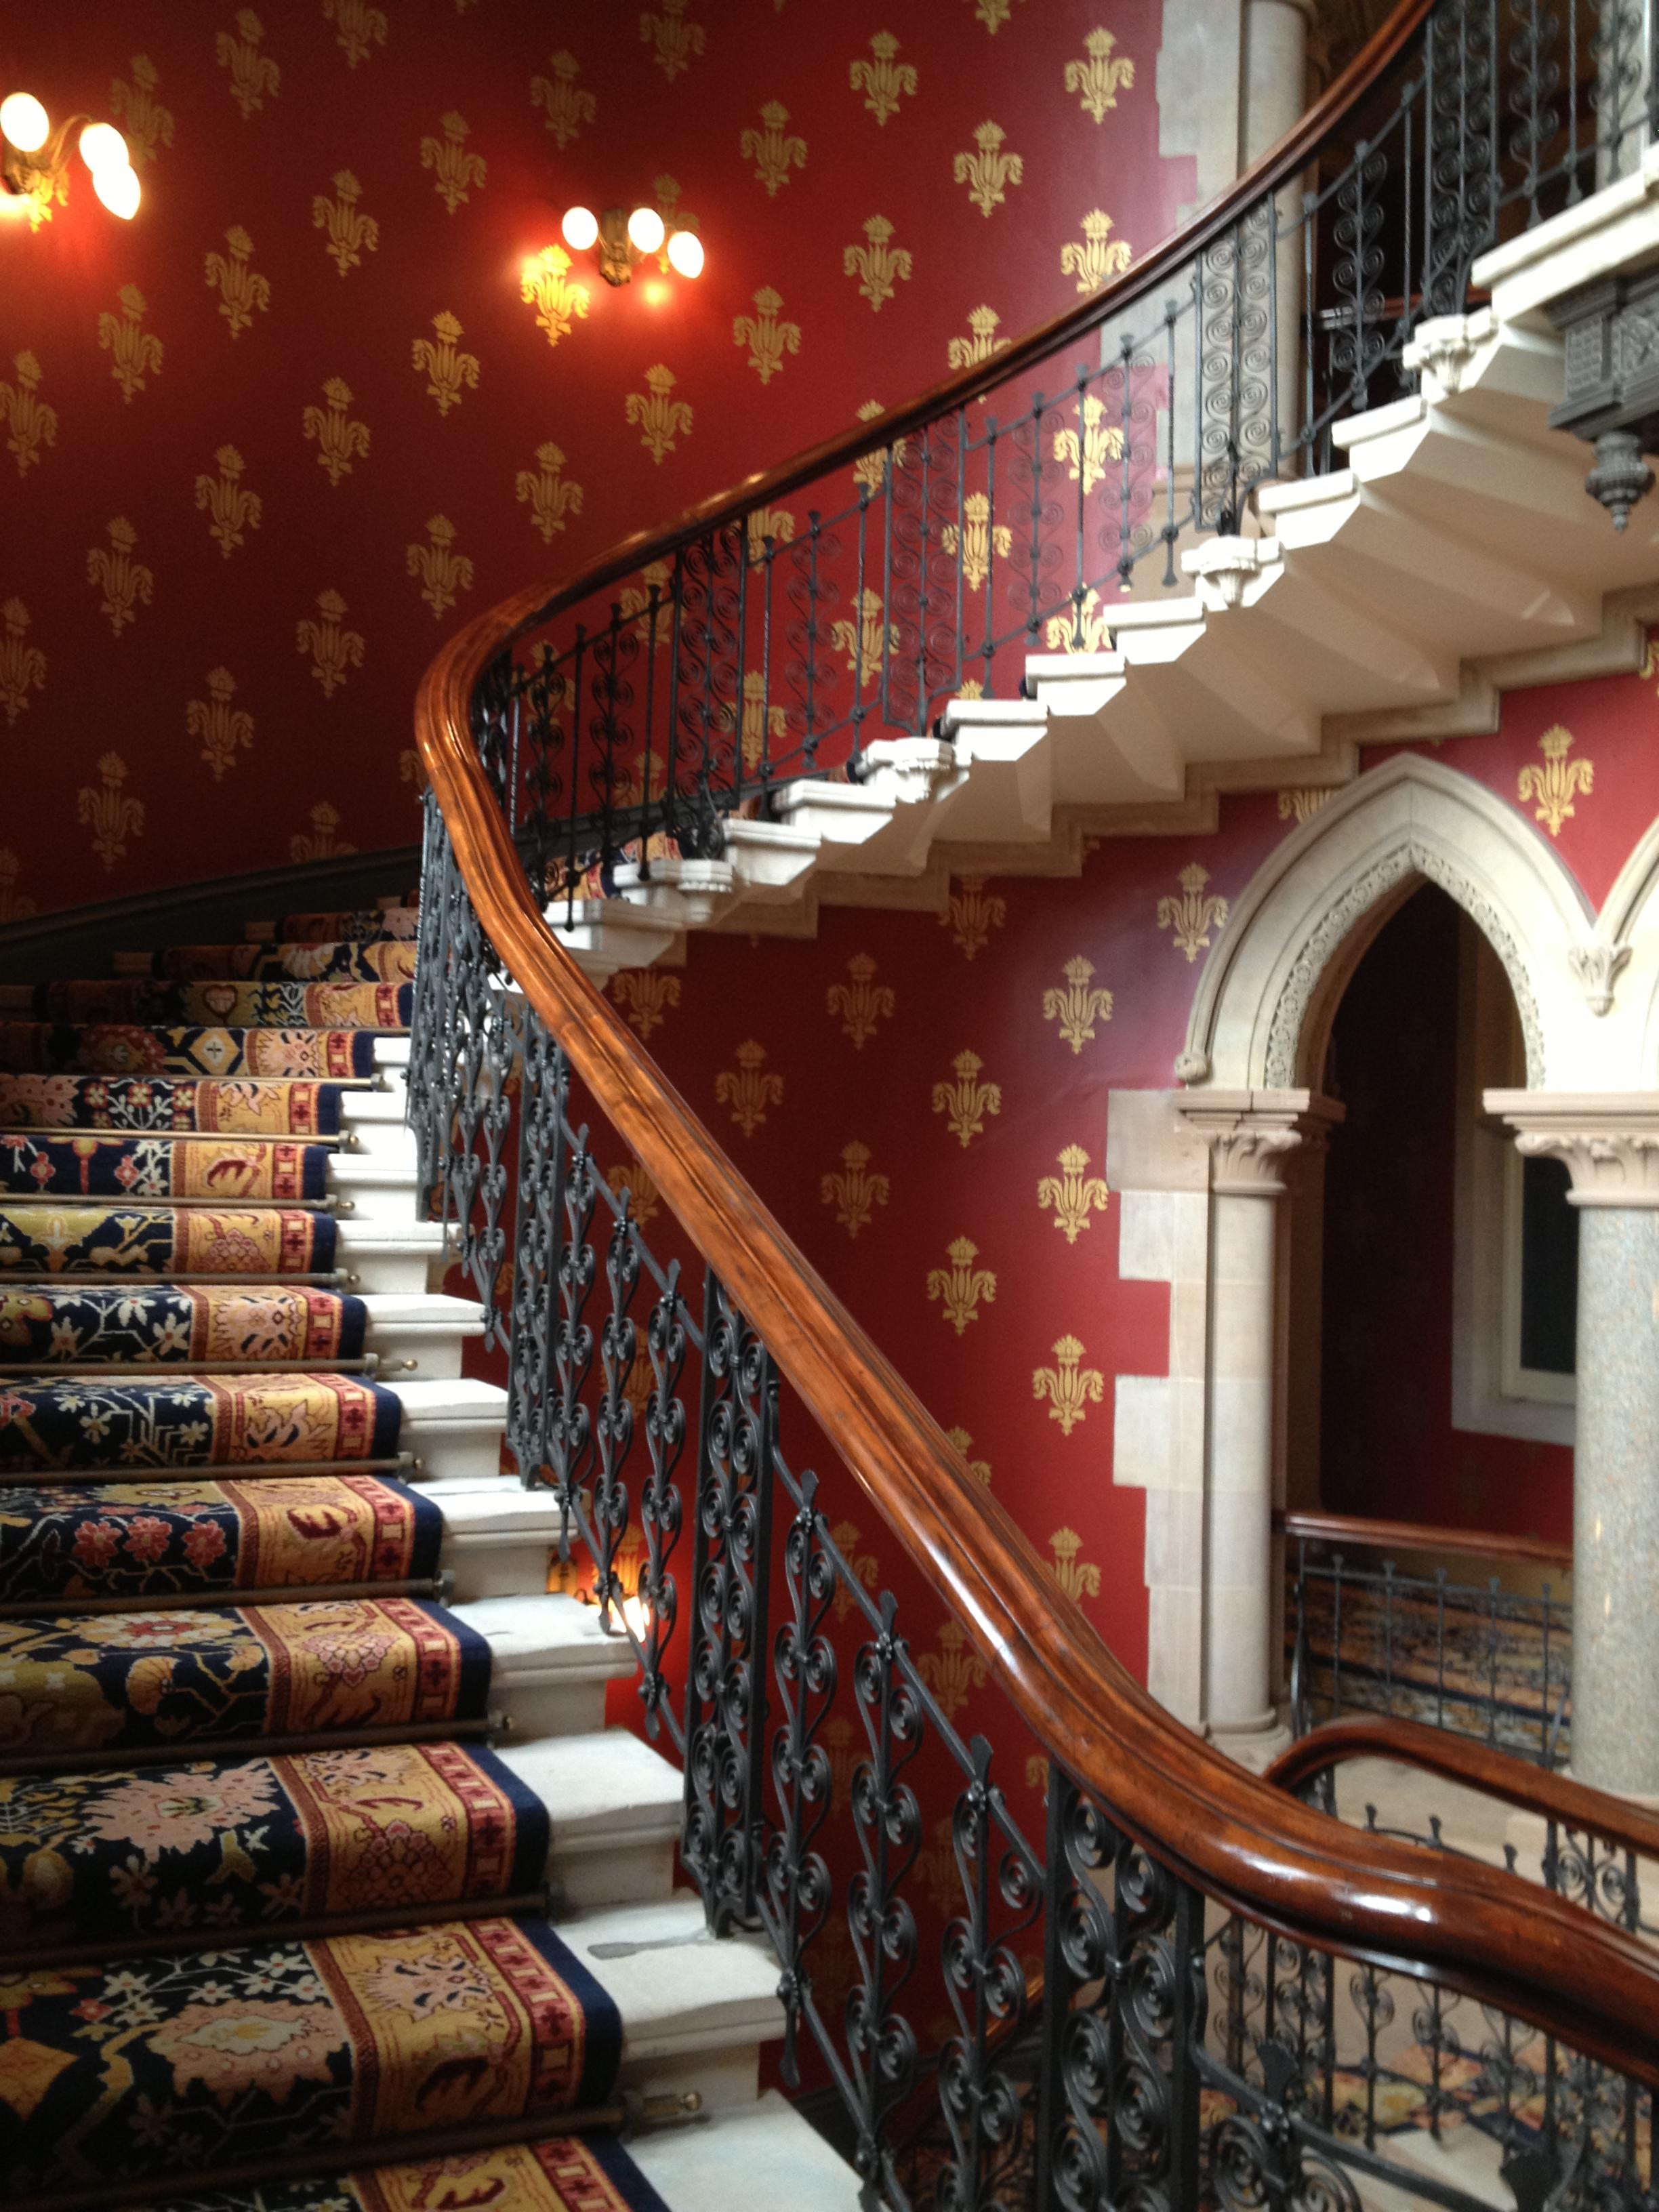 Grand Staircases of London #2 (St. Pancras Renaissance